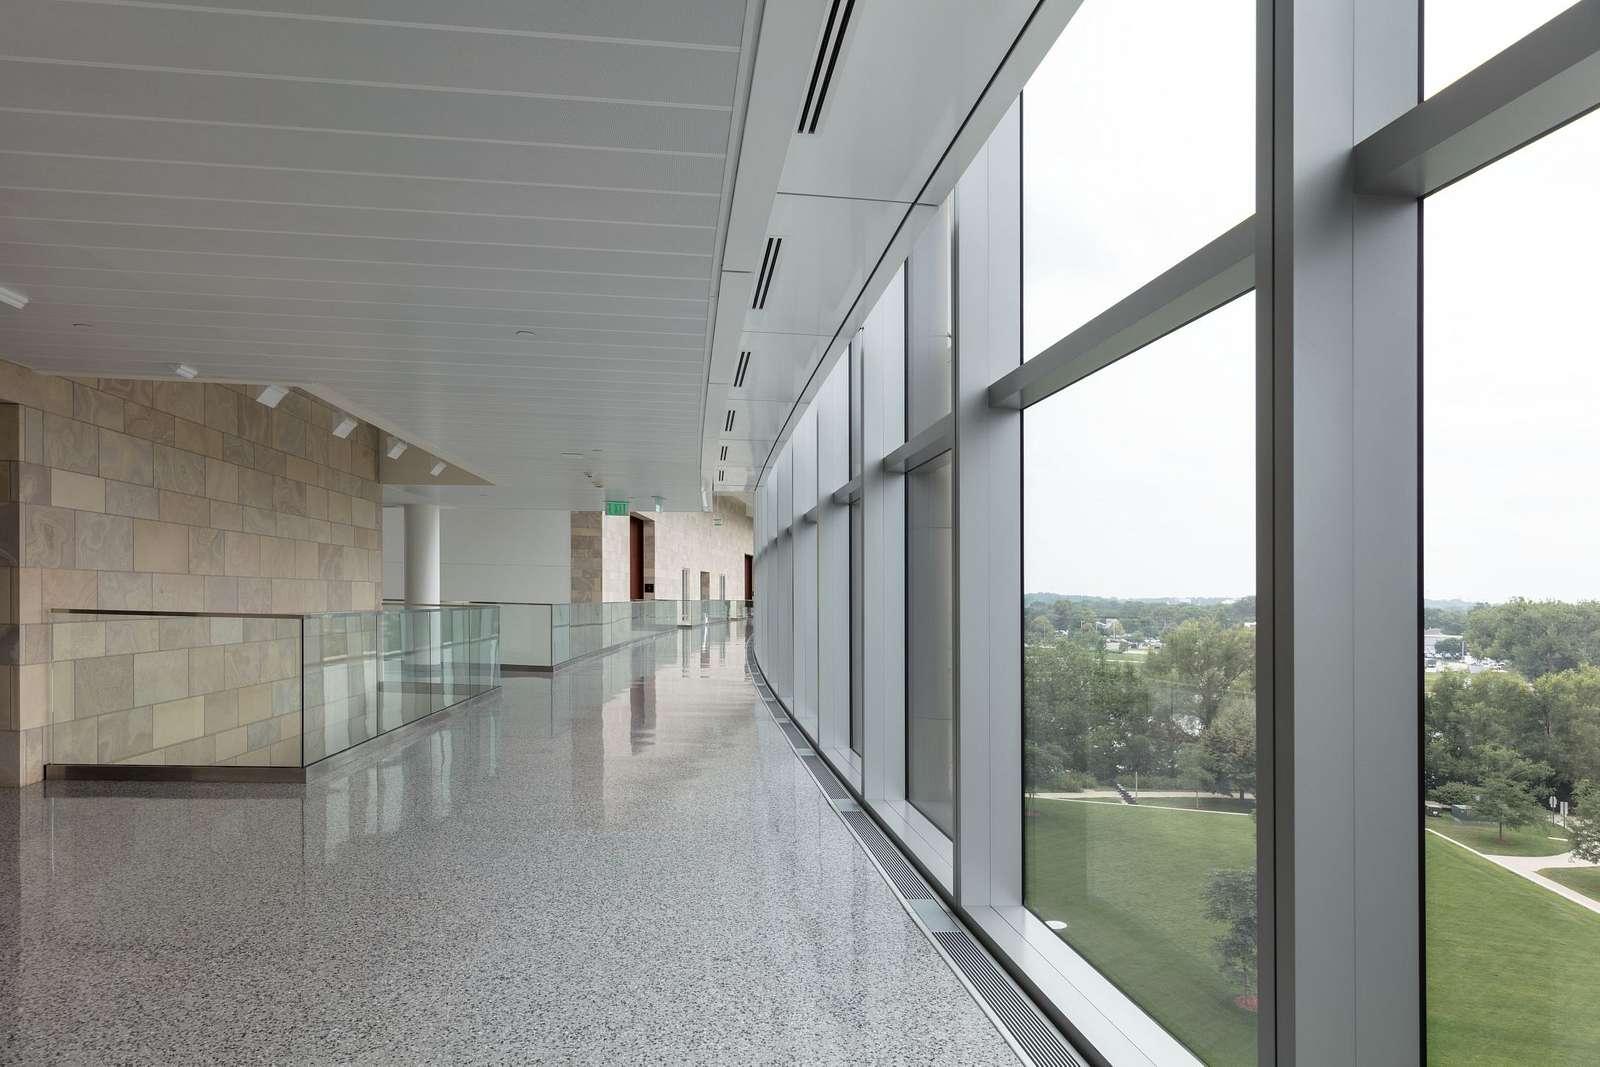 Corridor and windows. U.S. Courthouse and Federal Building, Cedar Rapids, Iowa